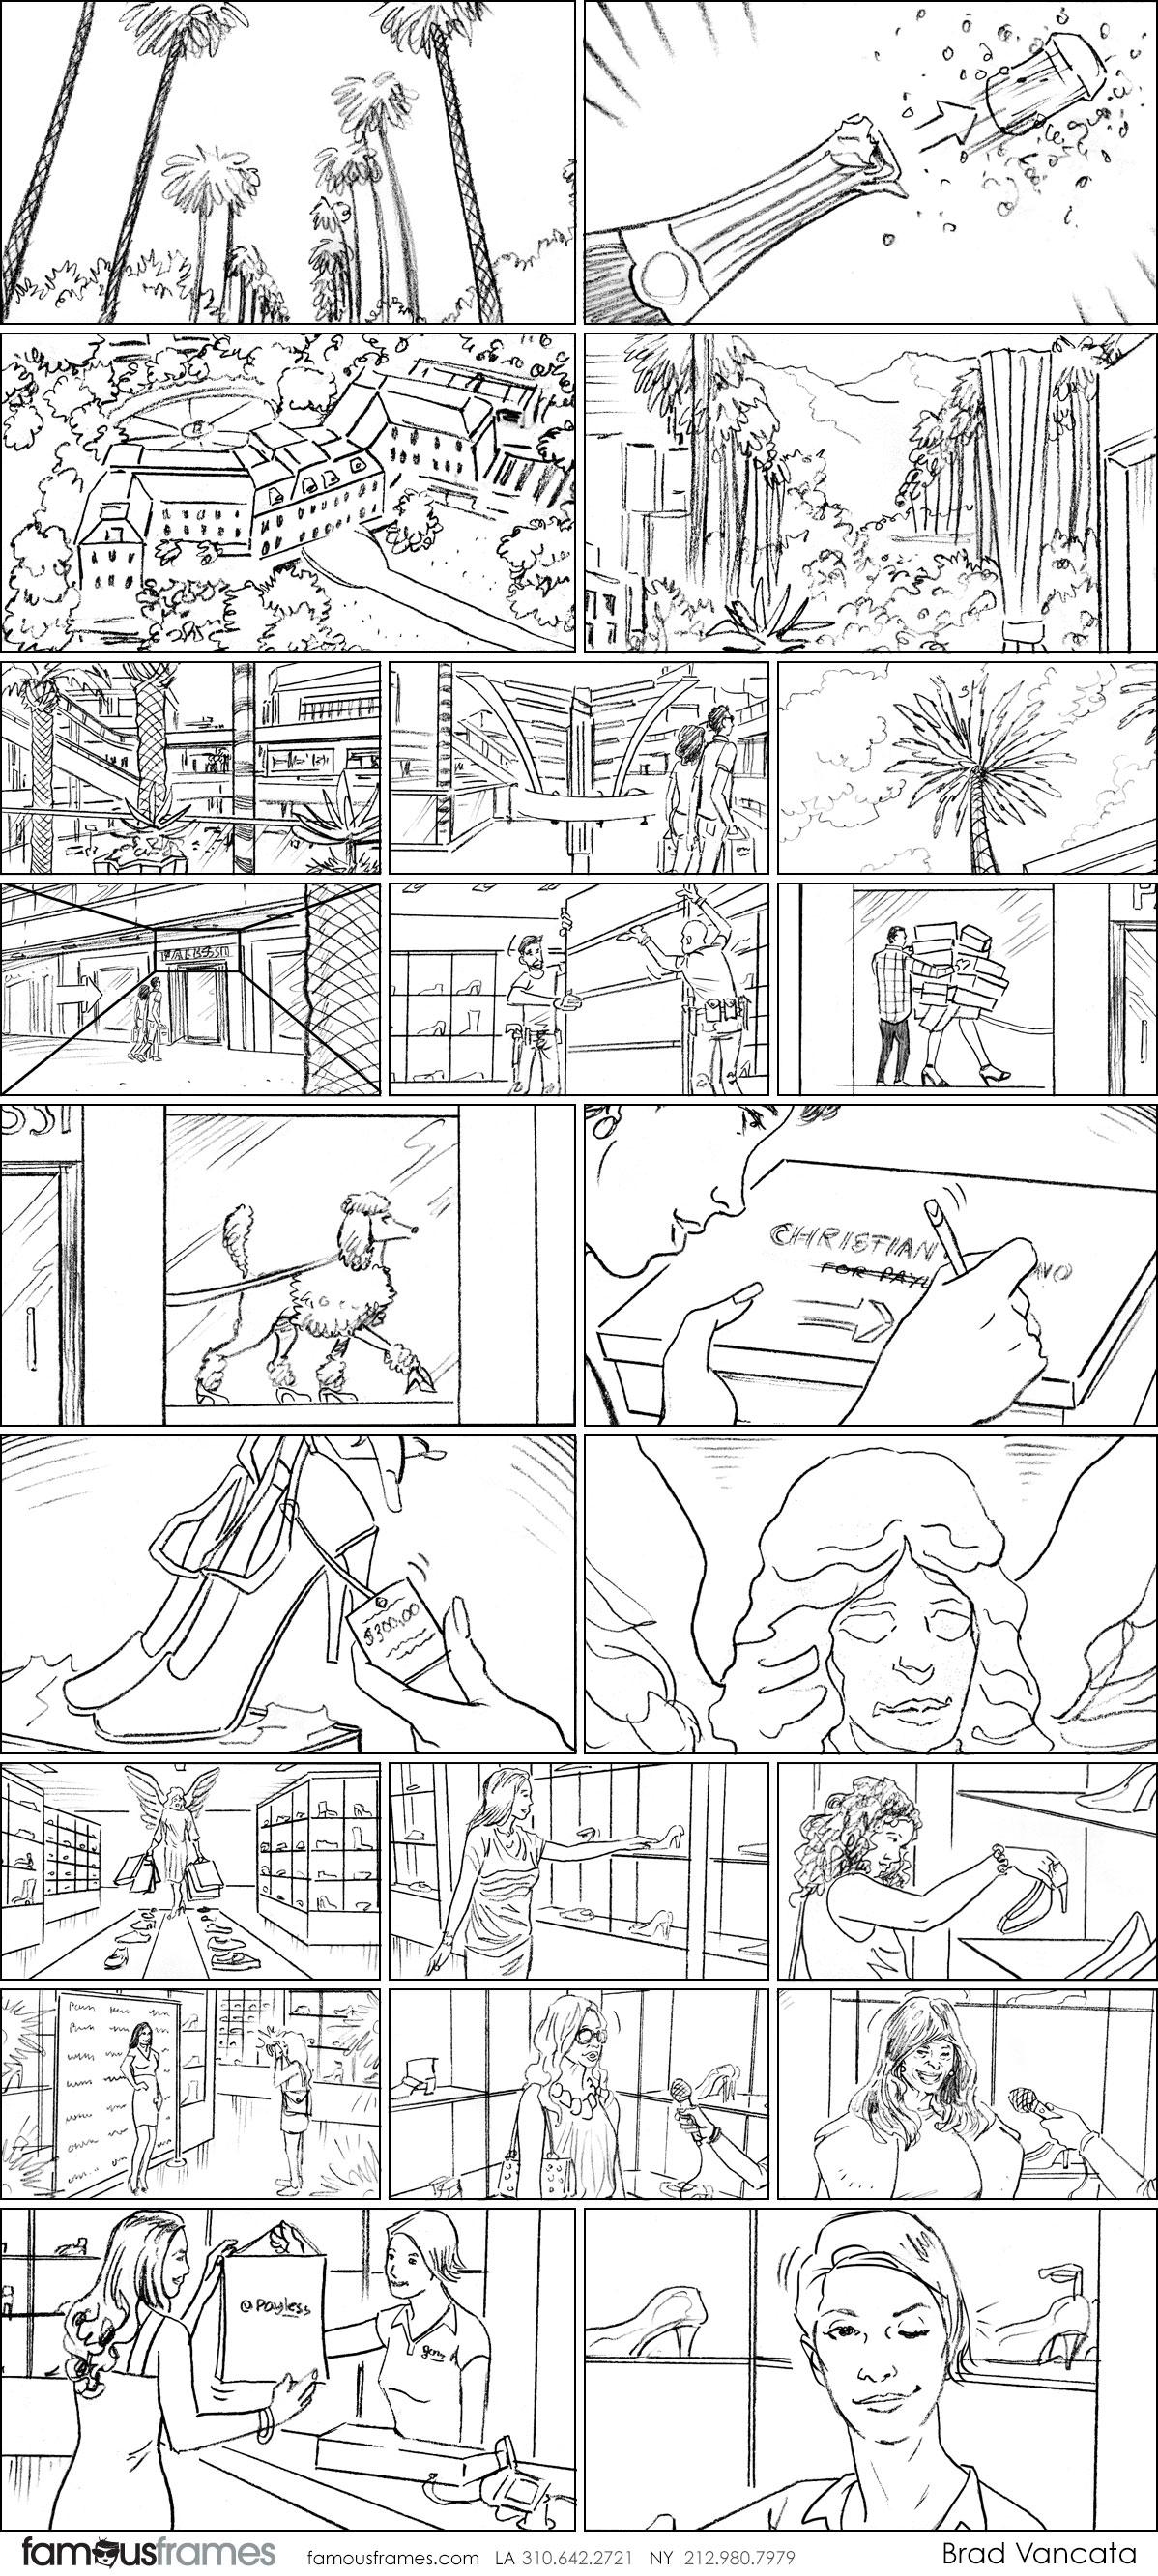 Brad Vancata's People - B&W Line storyboard art (Image #26_114_1574815204)